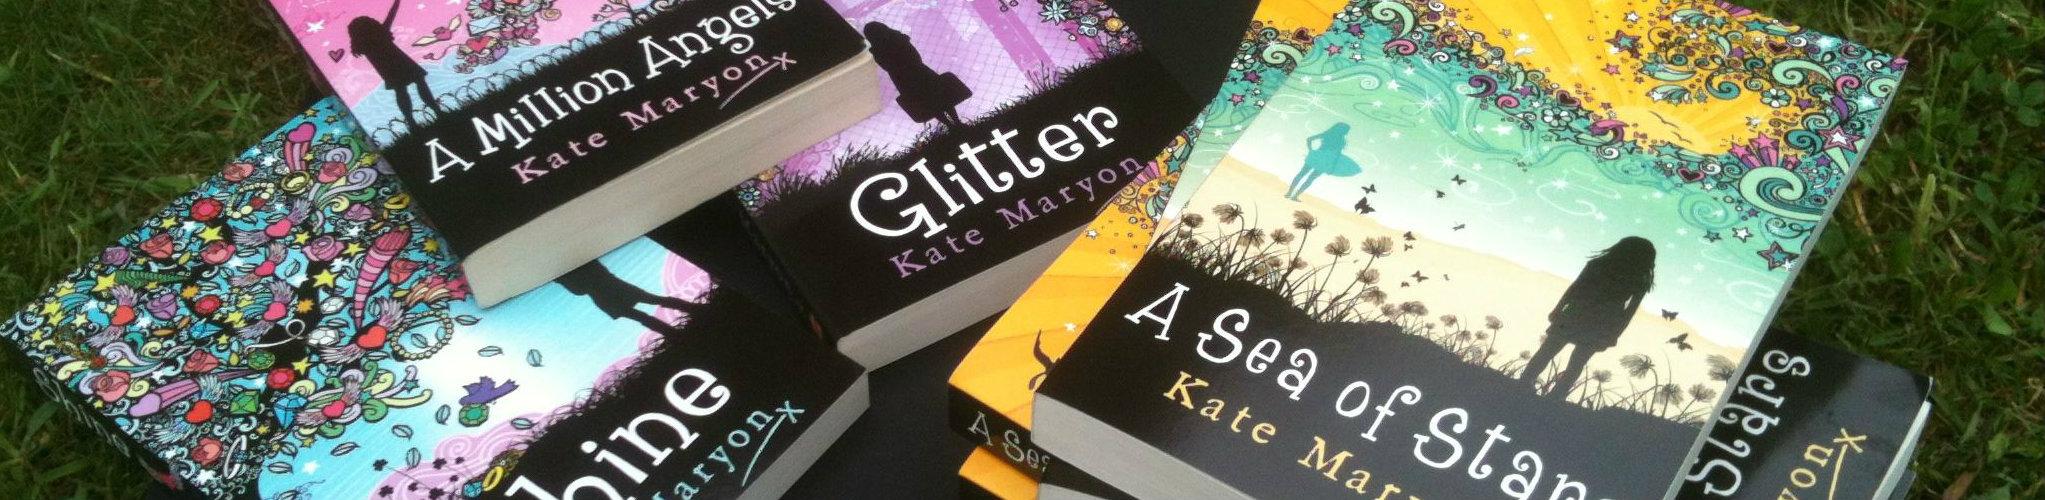 book pile banner.jpg